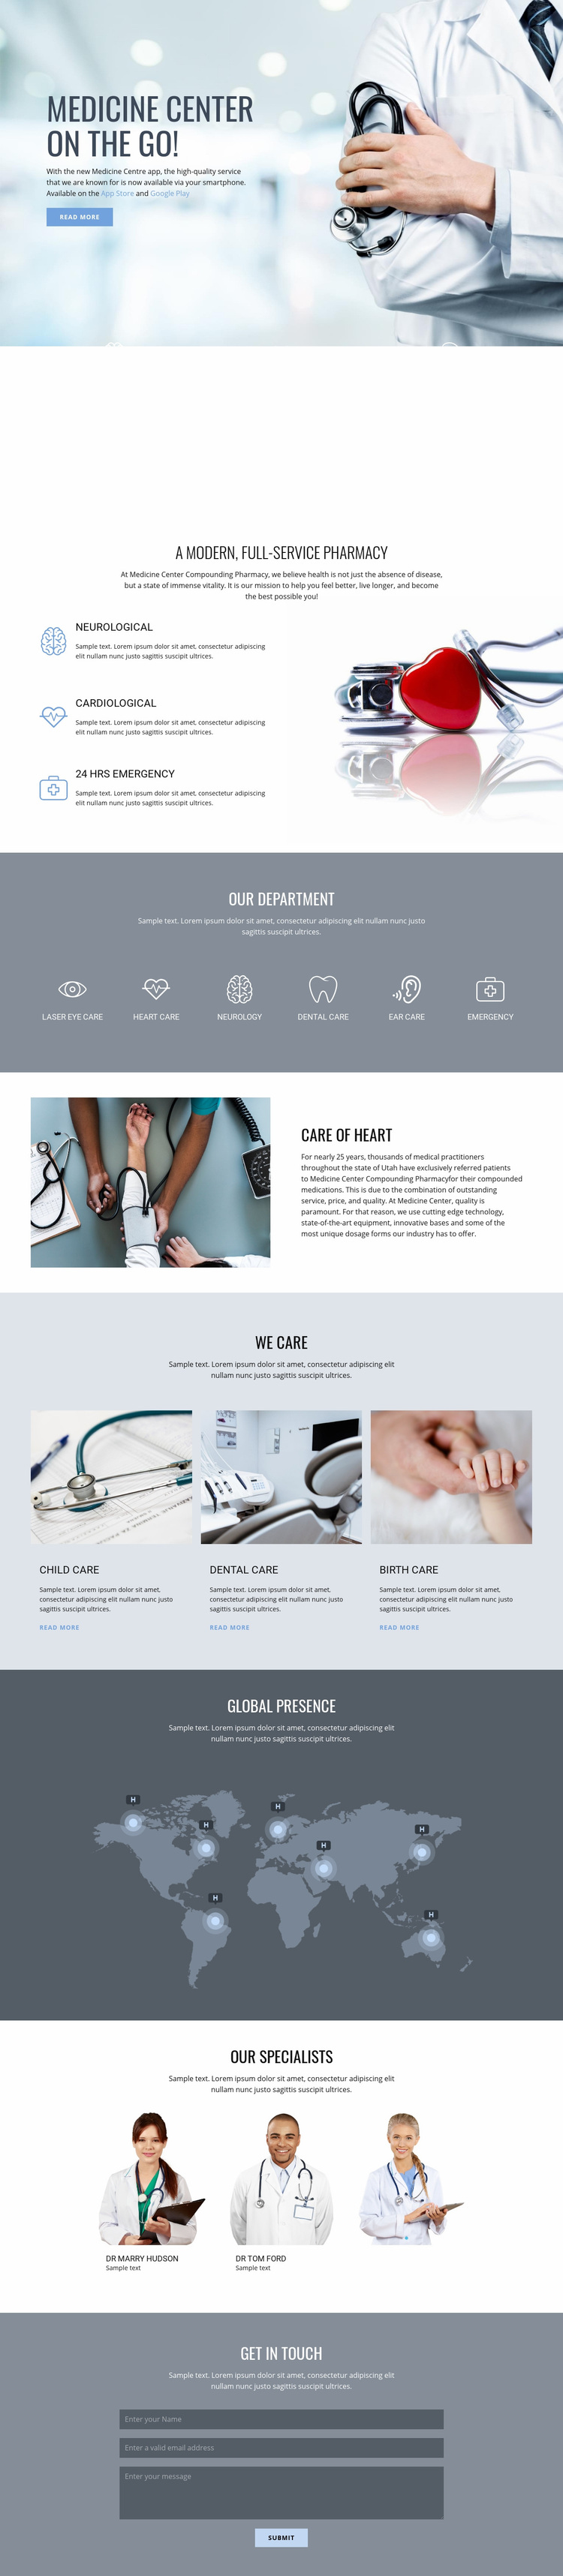 Pharmacy and medicine Web Page Designer